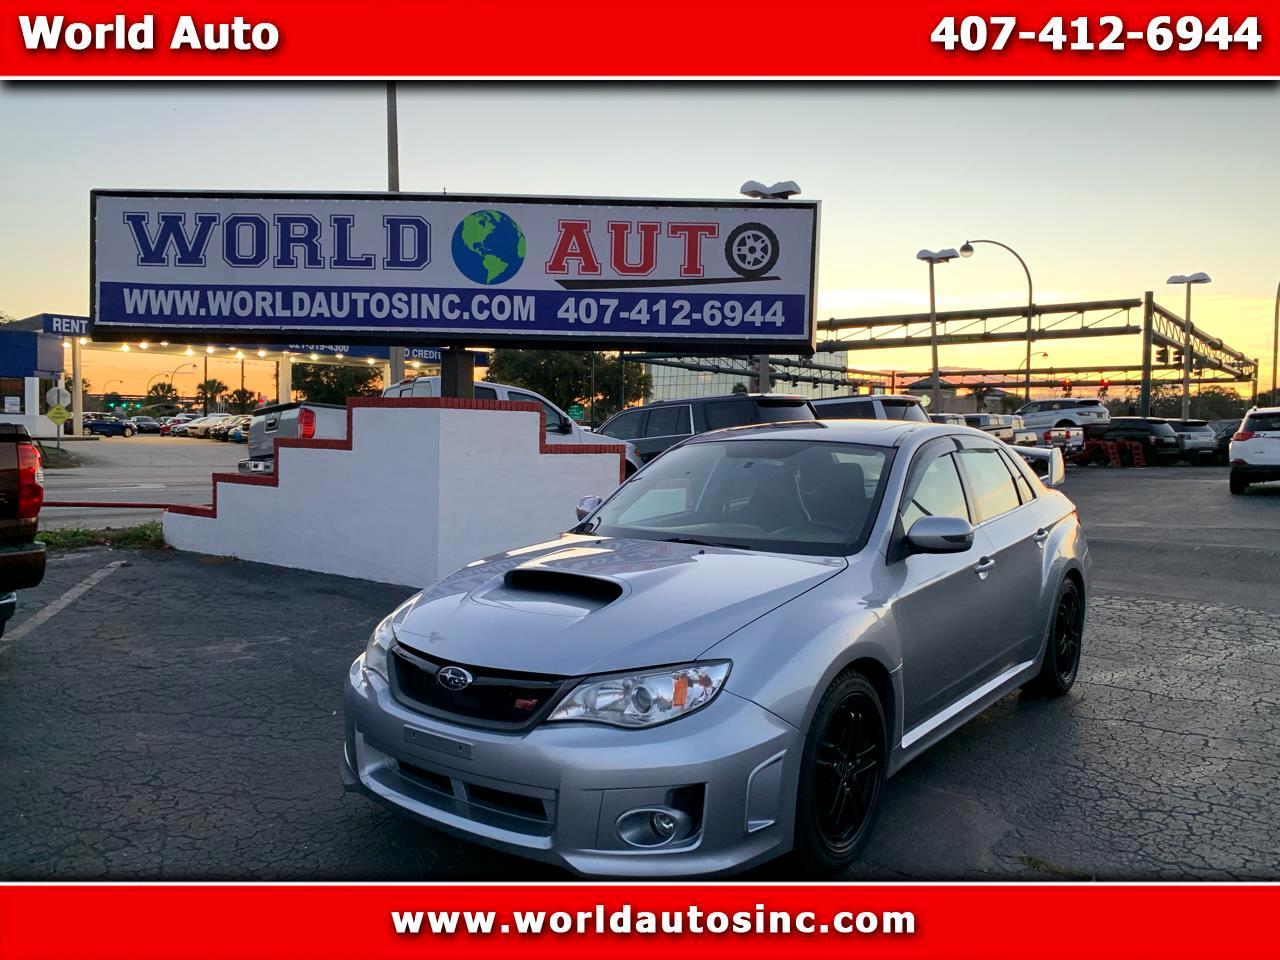 2012 Subaru Impreza WRX STI 4-Door